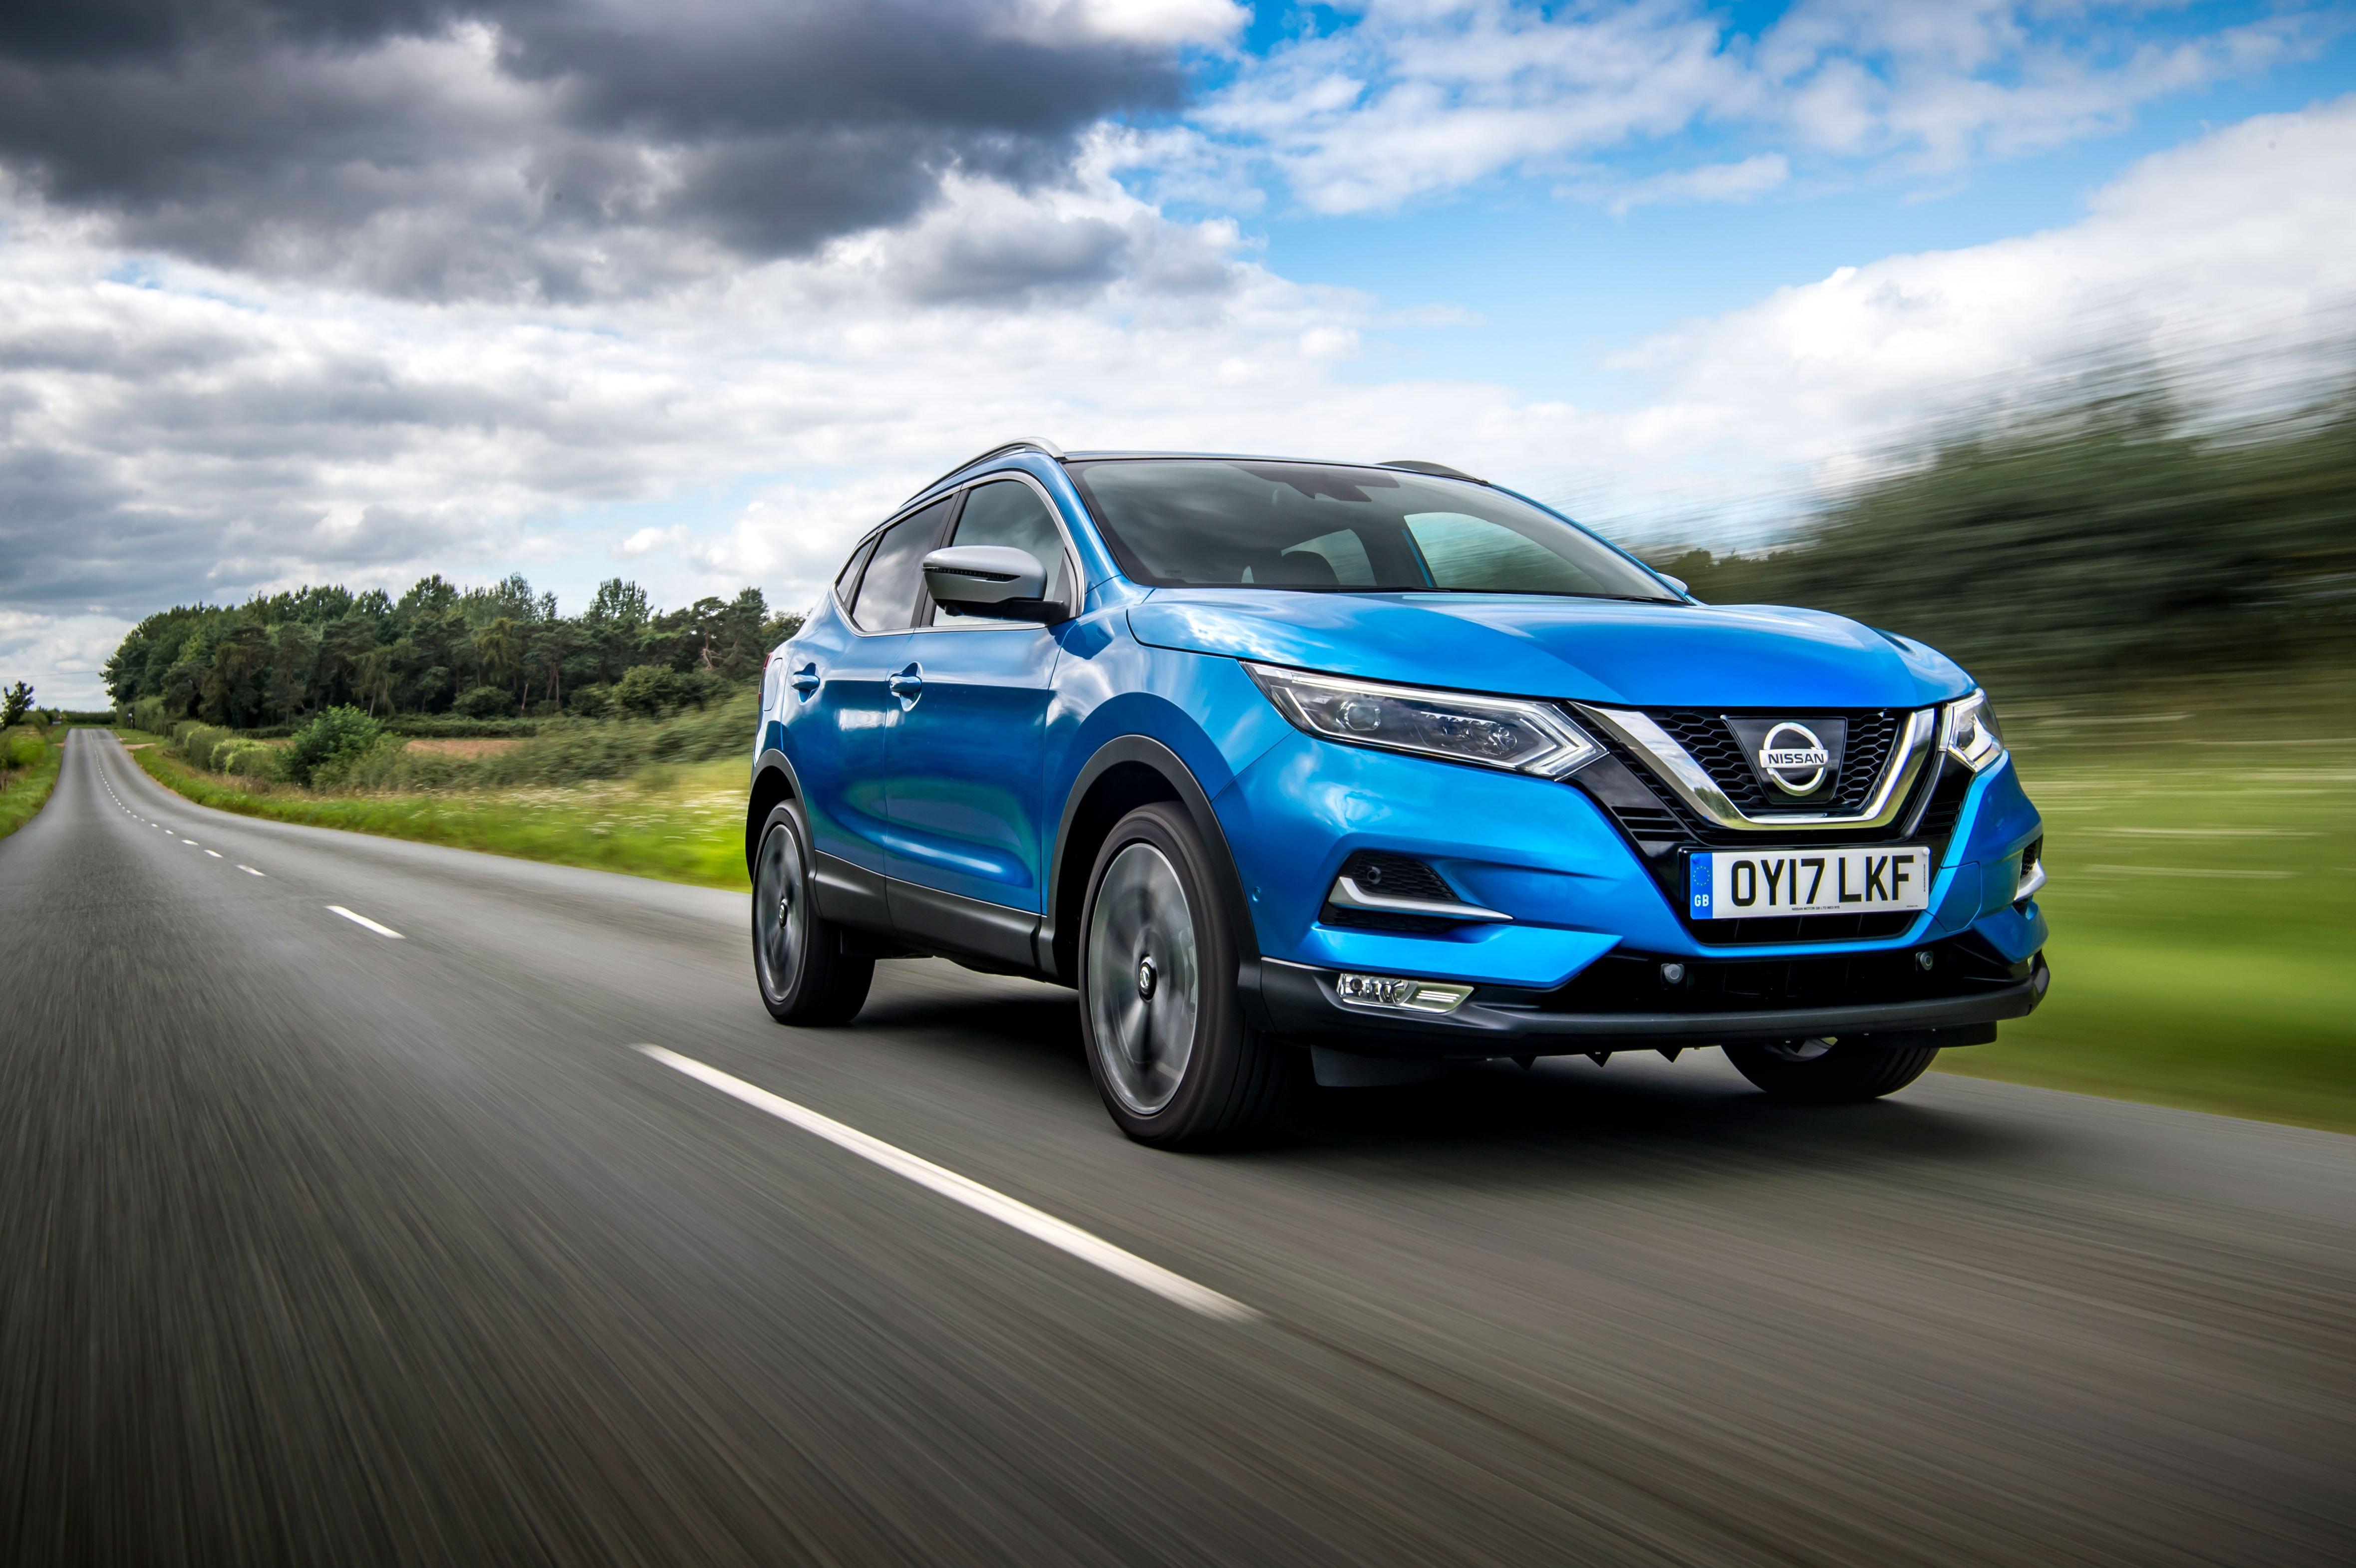 Nissan Intelligent Mobility : διάκριση στα βραβεία του Auto Express για τα νέα αυτοκίνητα